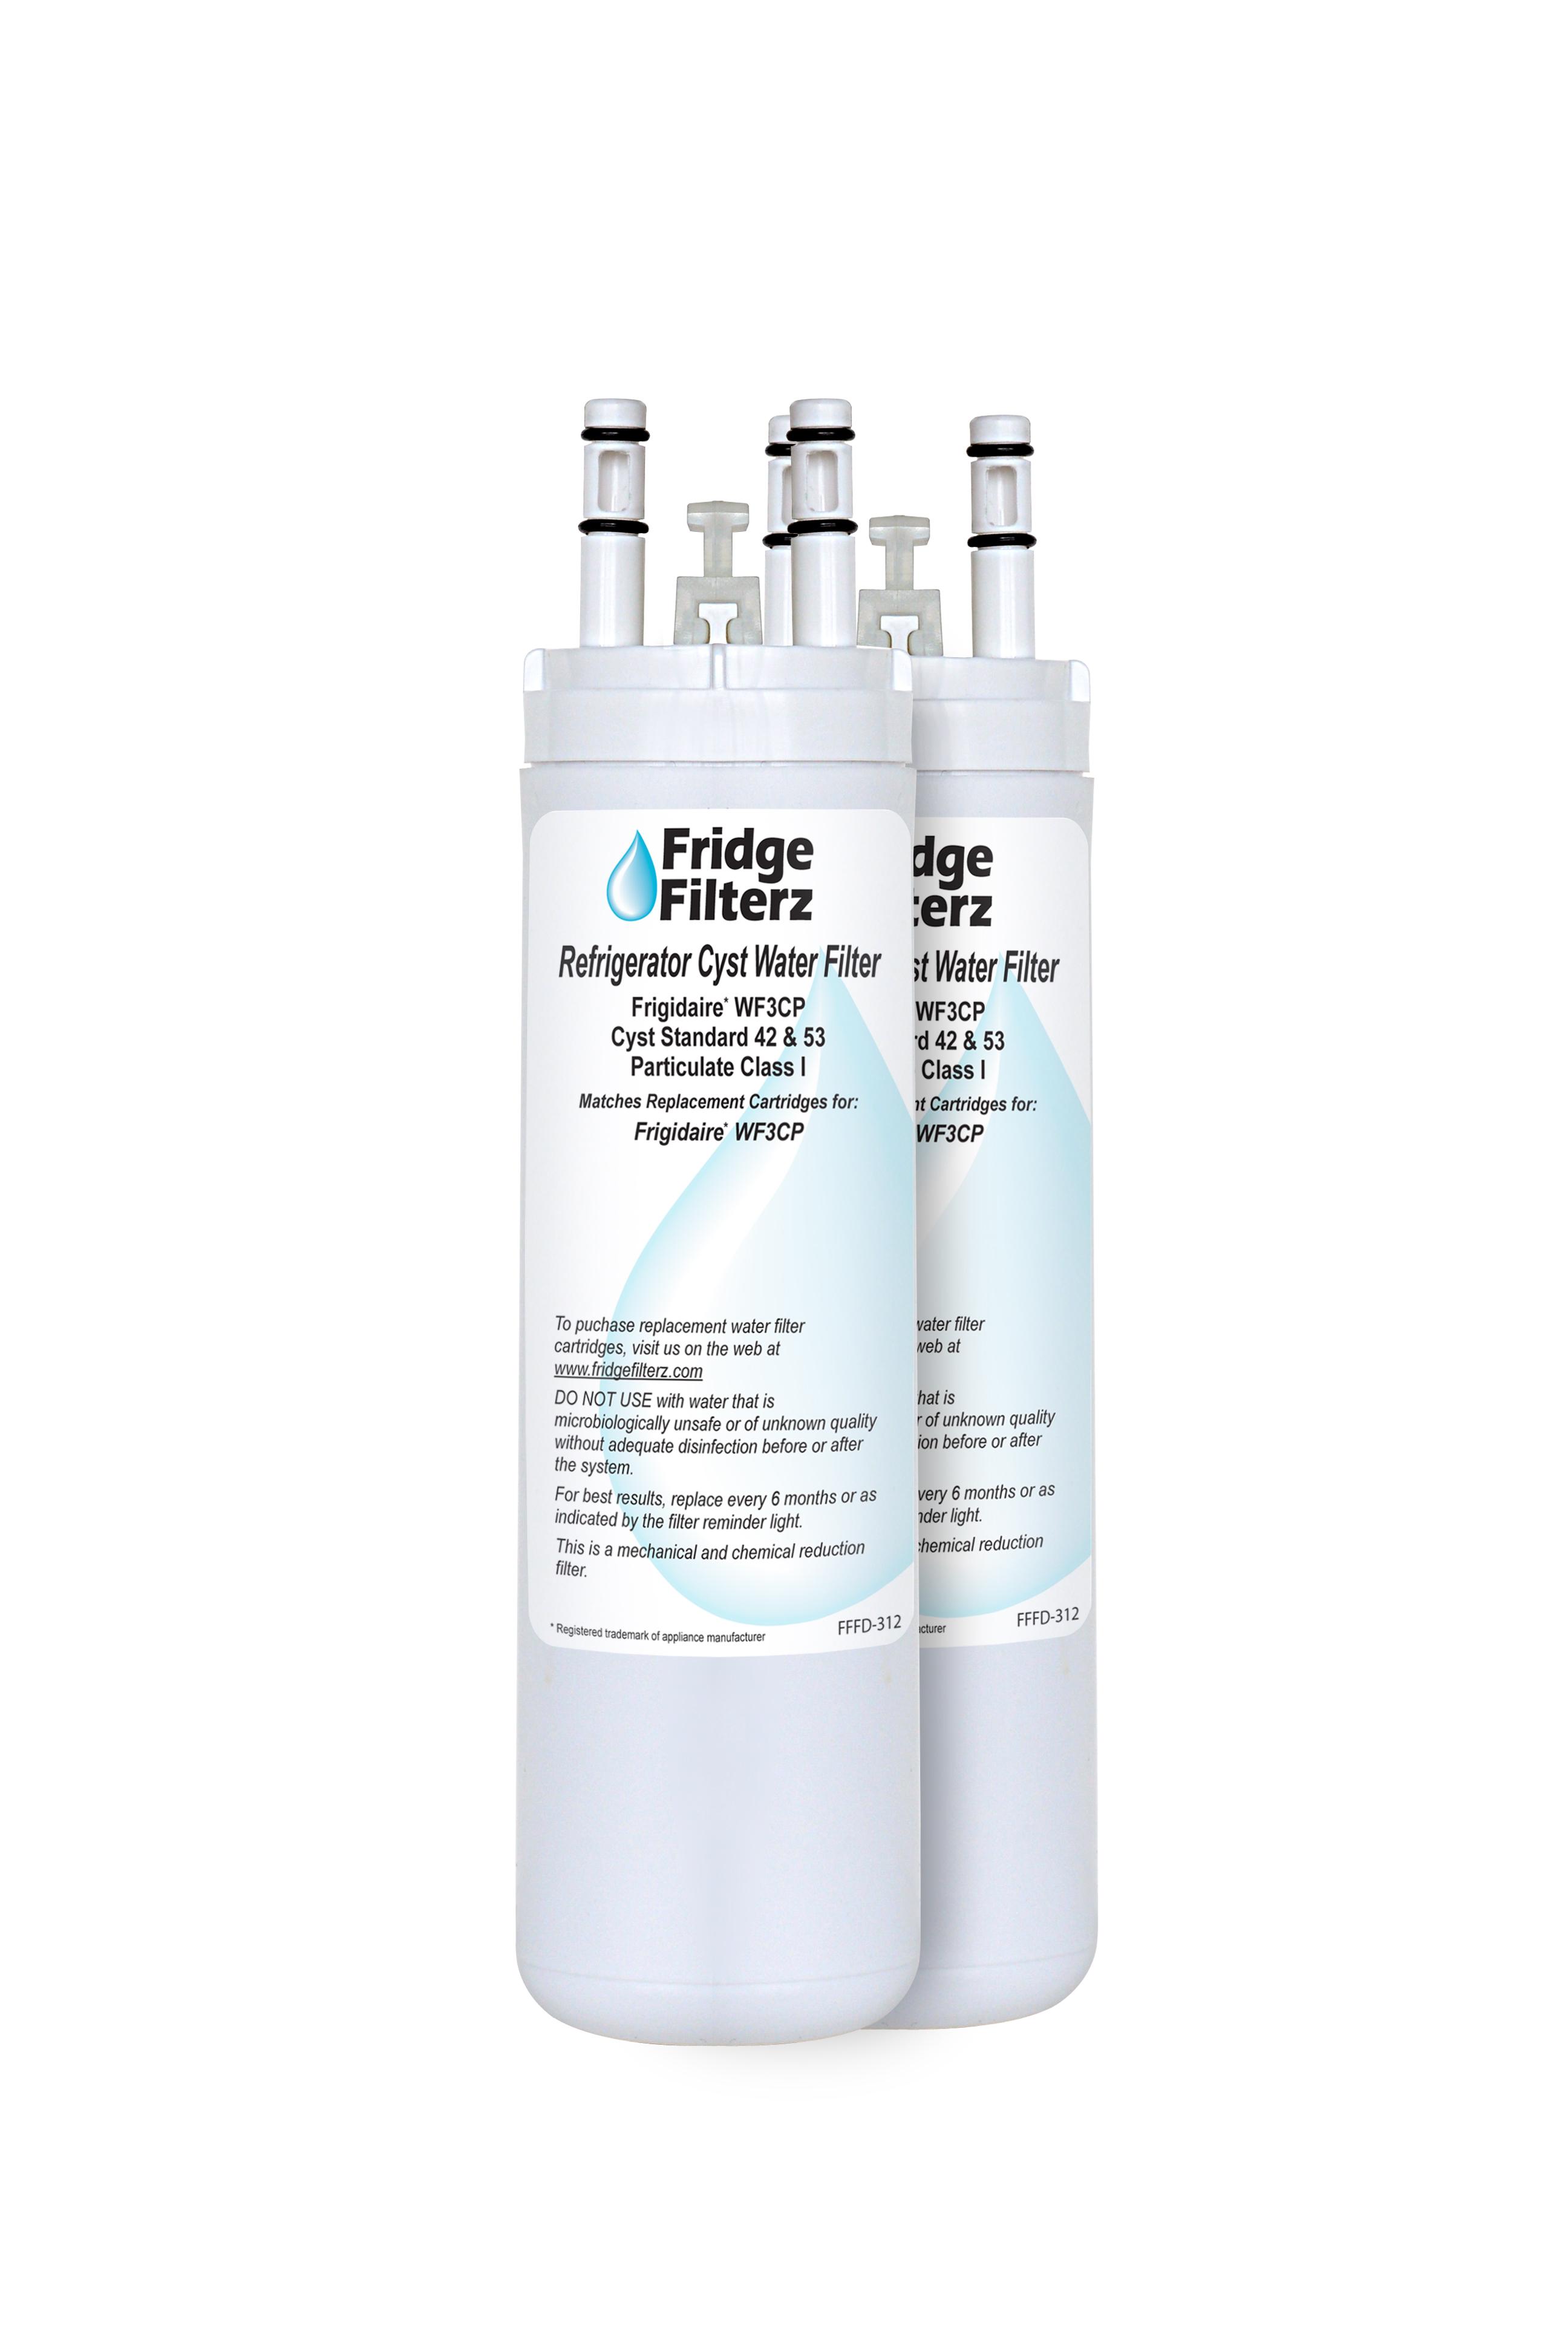 FridgeFilterz Refrigerator Water Filter for Frigidaire (2 Pack)